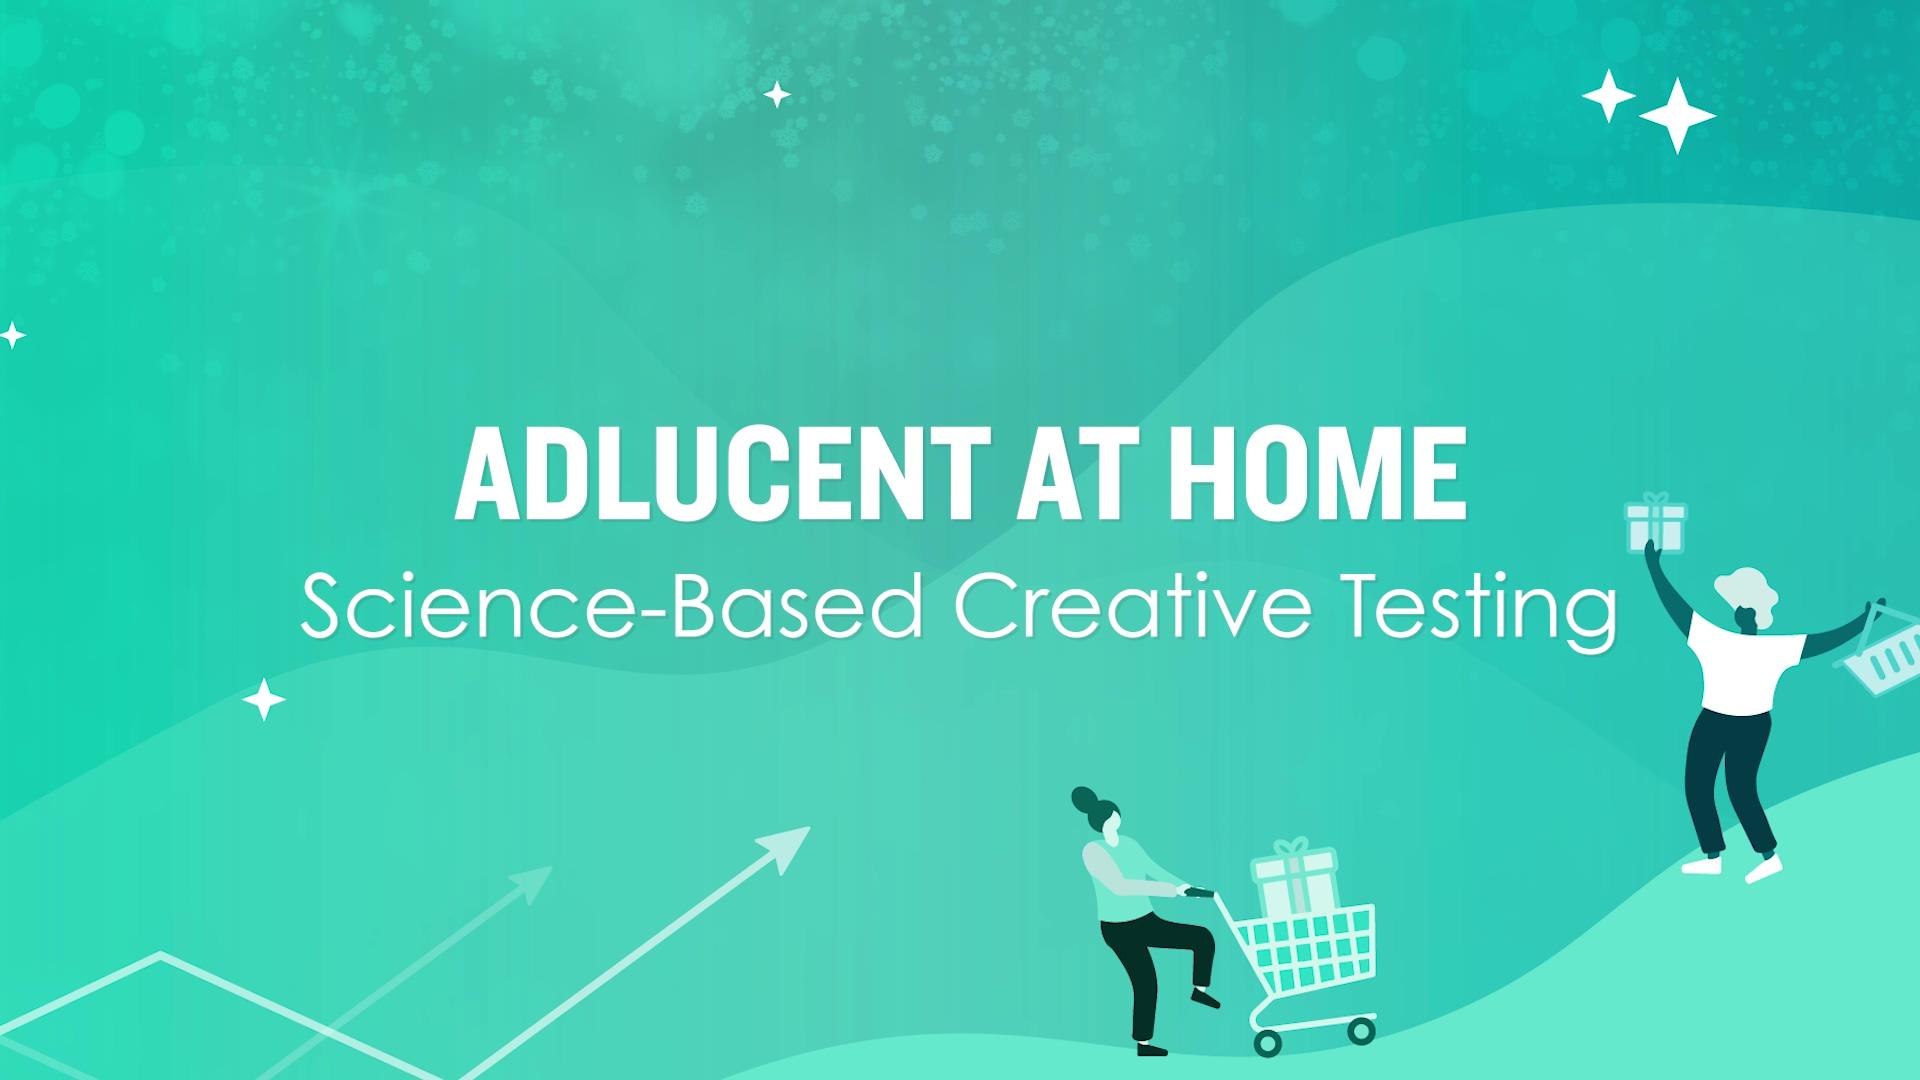 John-Liu-Science-Based-Creative-Testing-Video